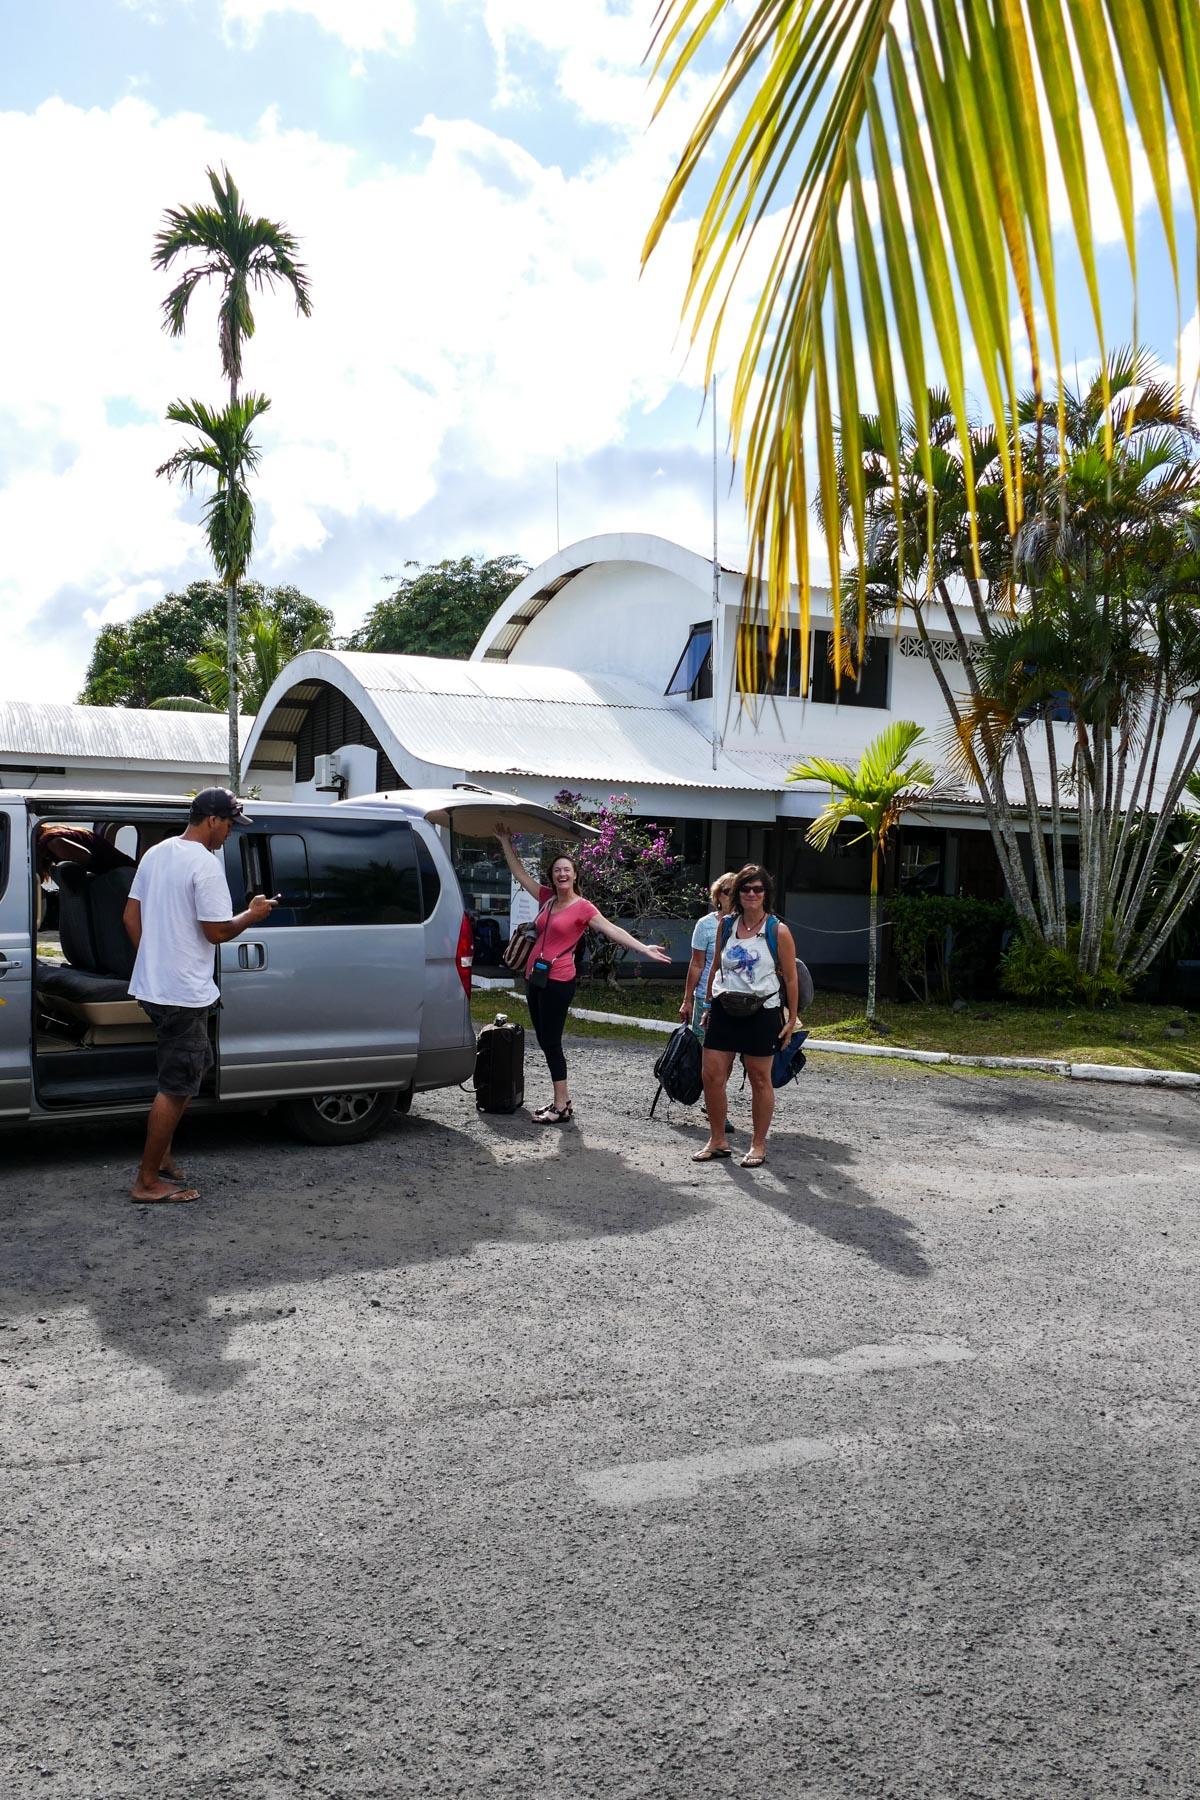 crew arriving